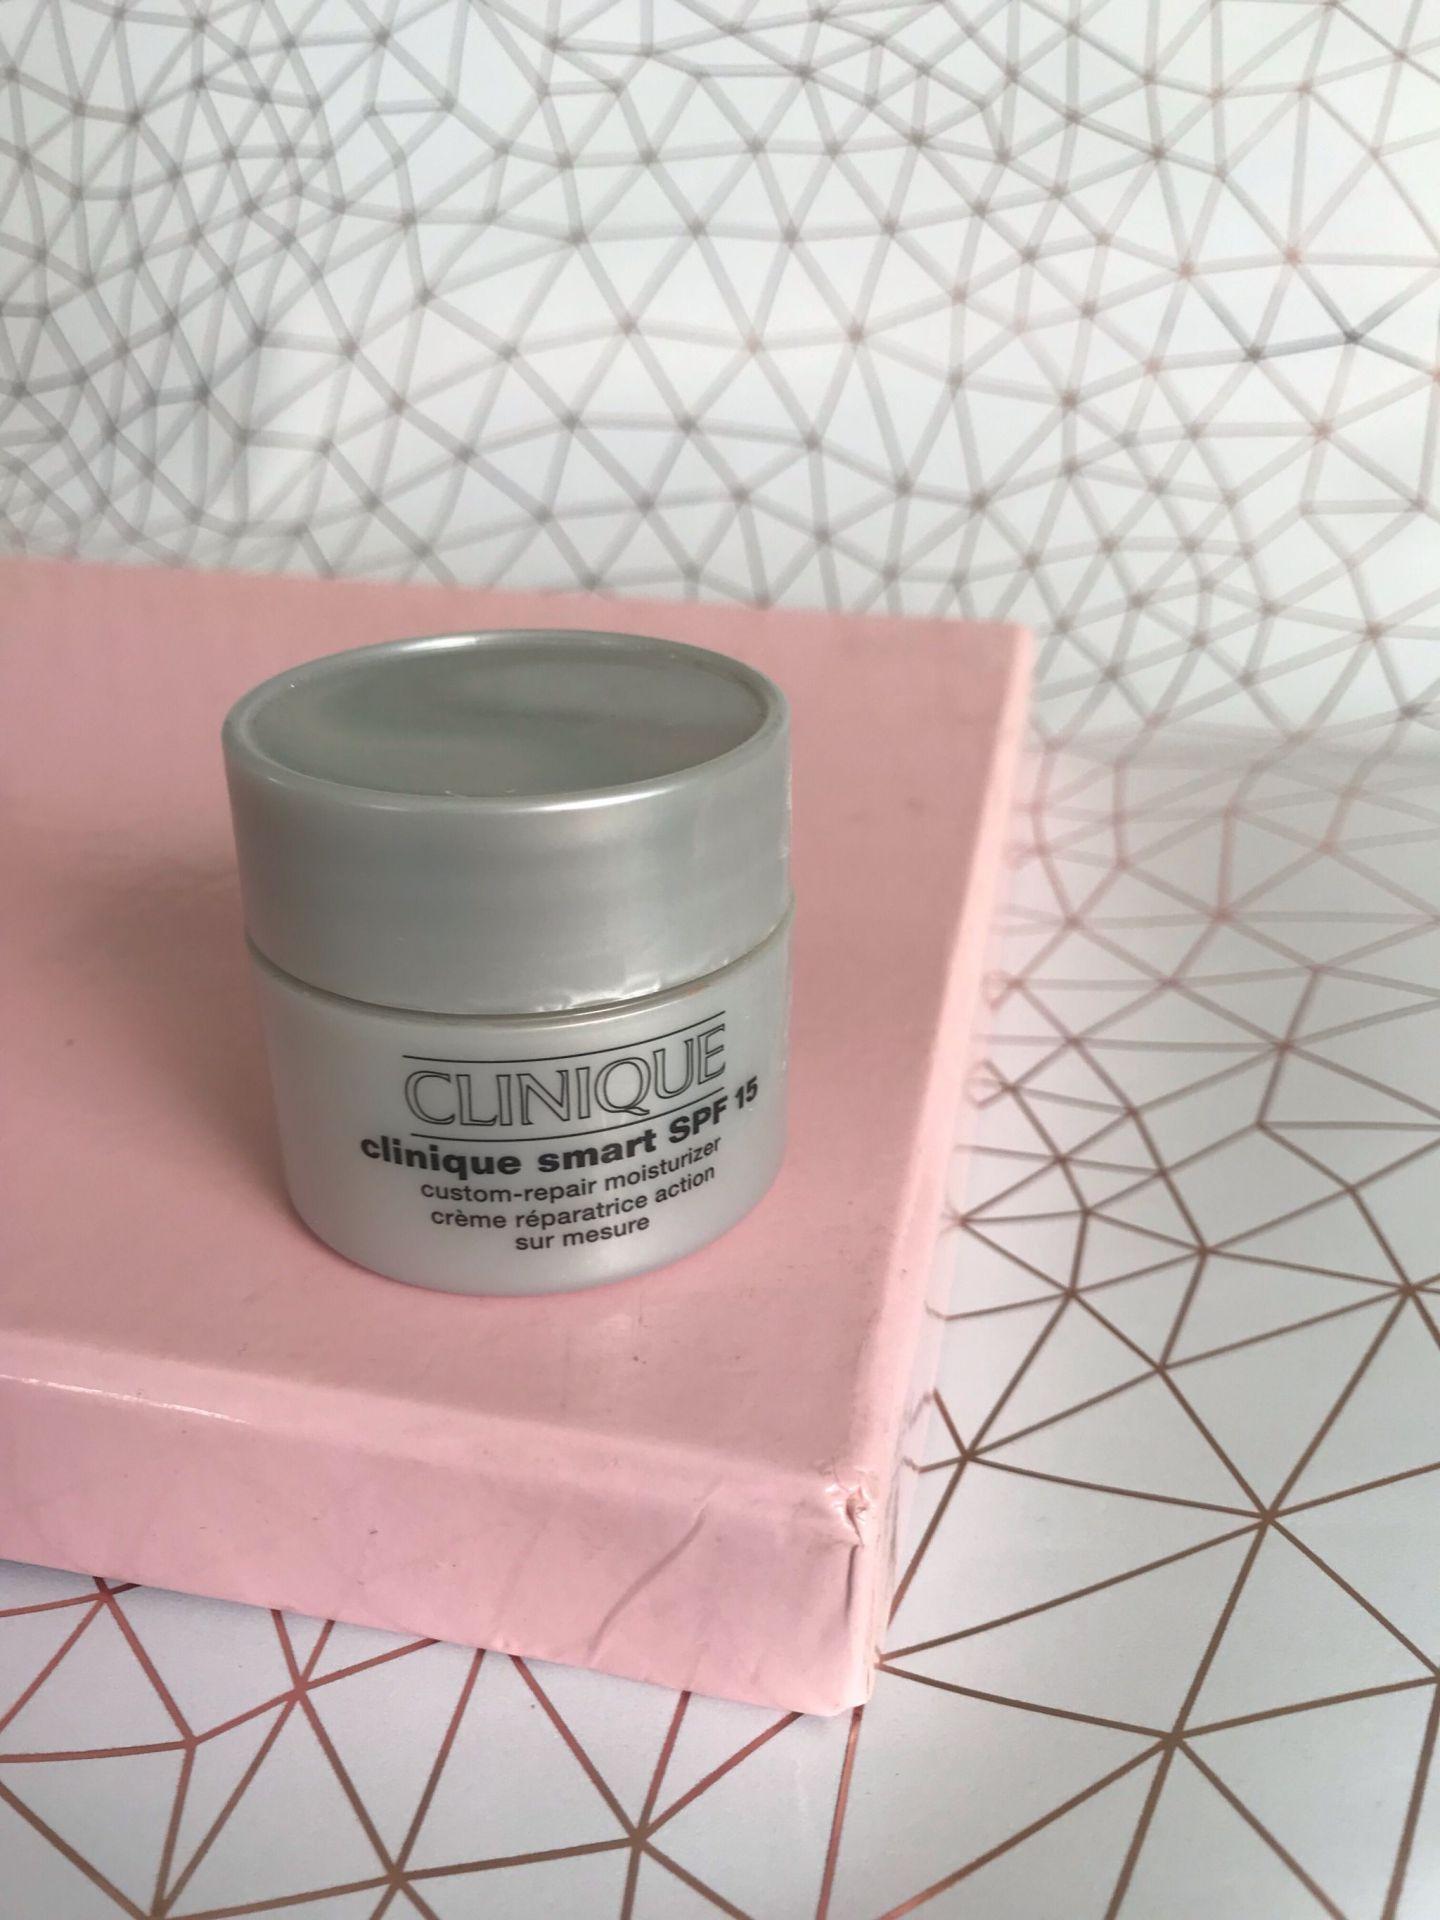 Clinique smart SPF moisturiser